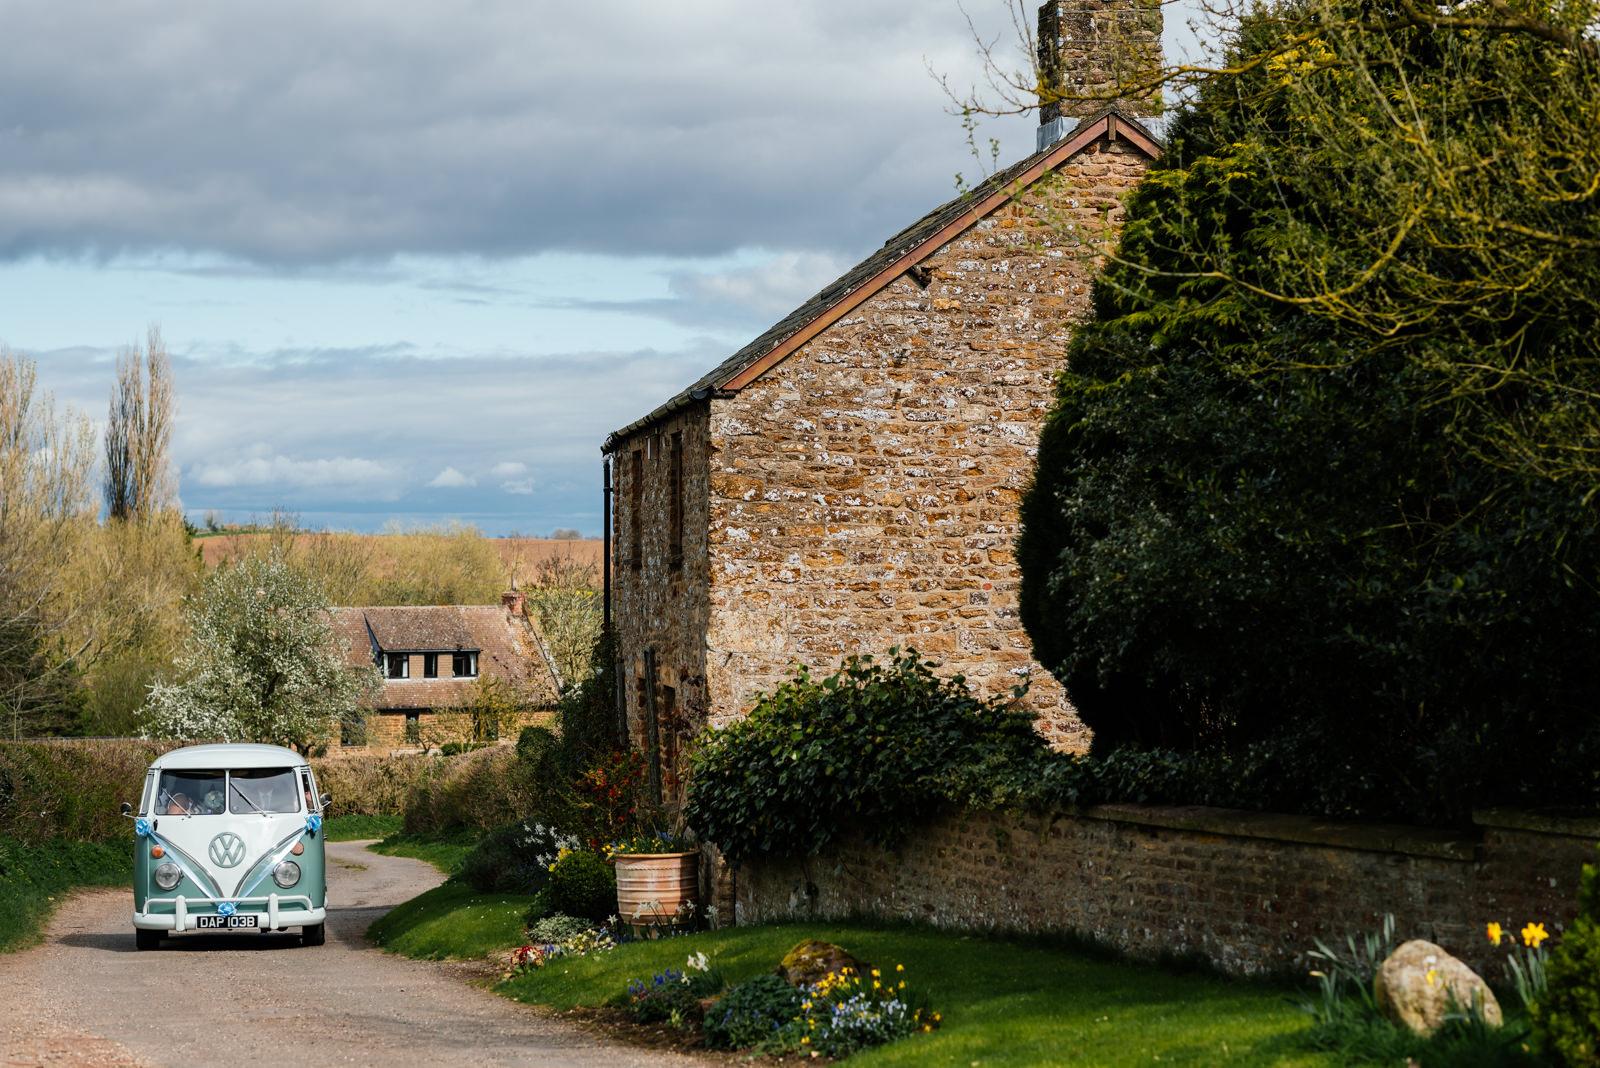 camper van arriving at church with bride and bridesmaids